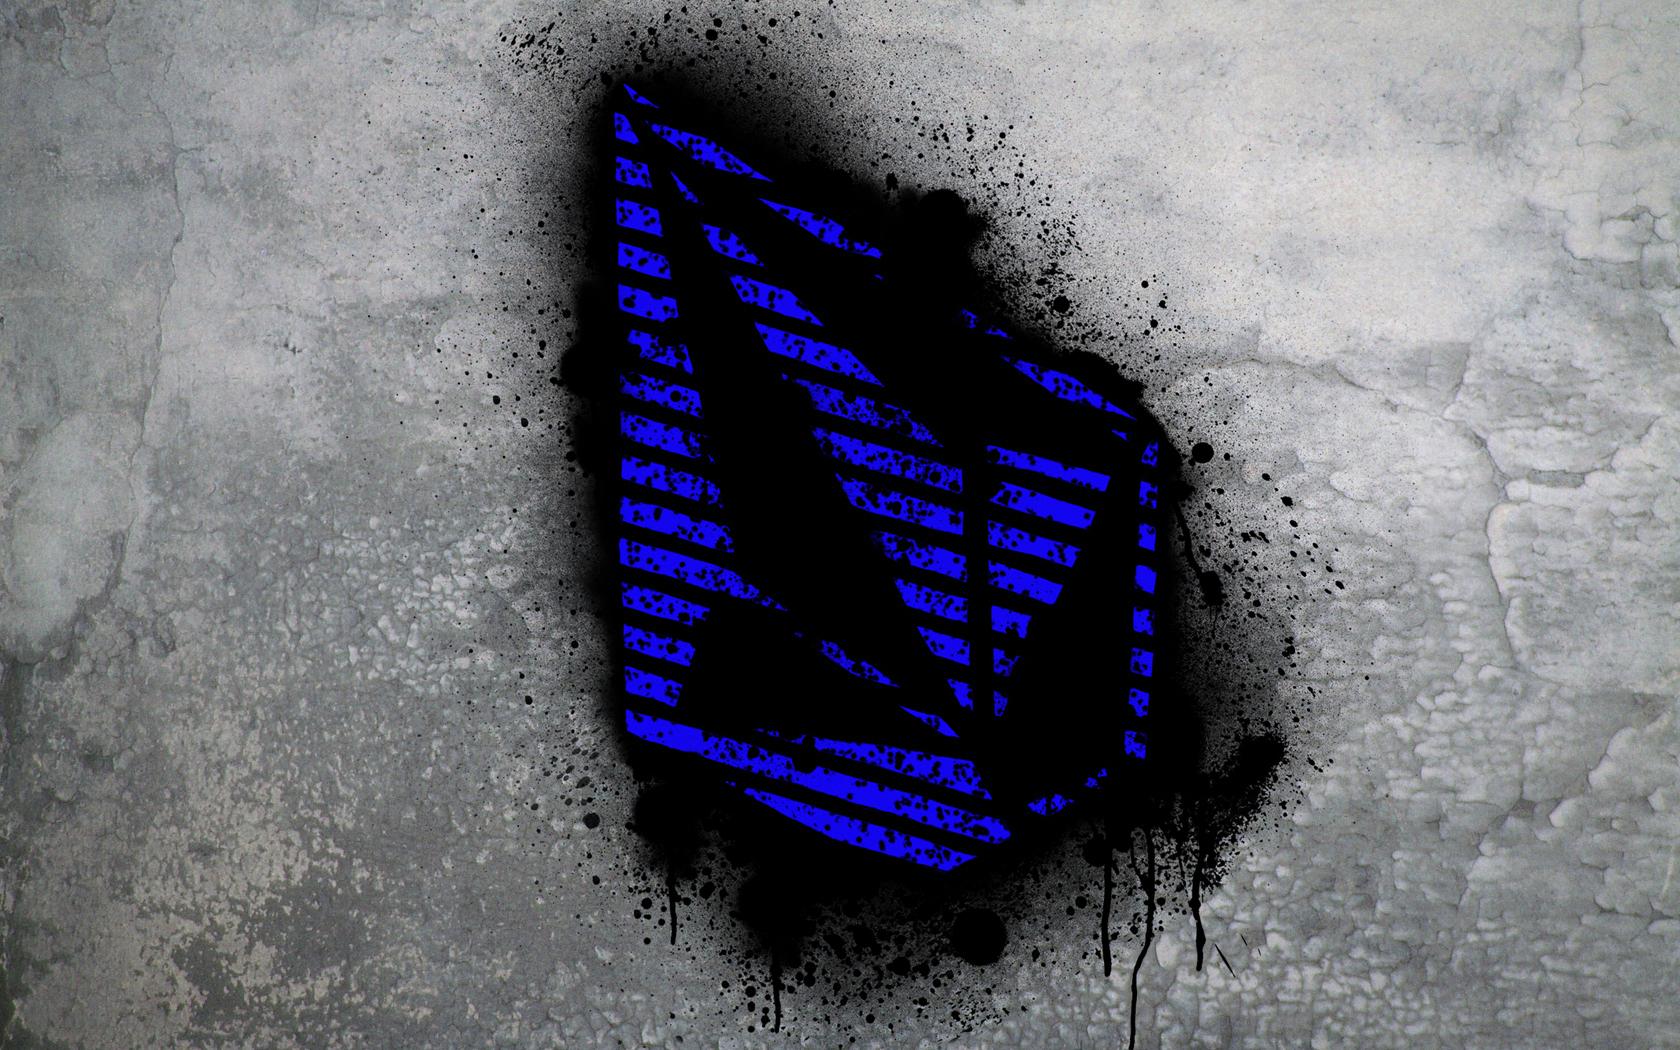 blue volcom stone graffiti fresh new hd wallpaper picture